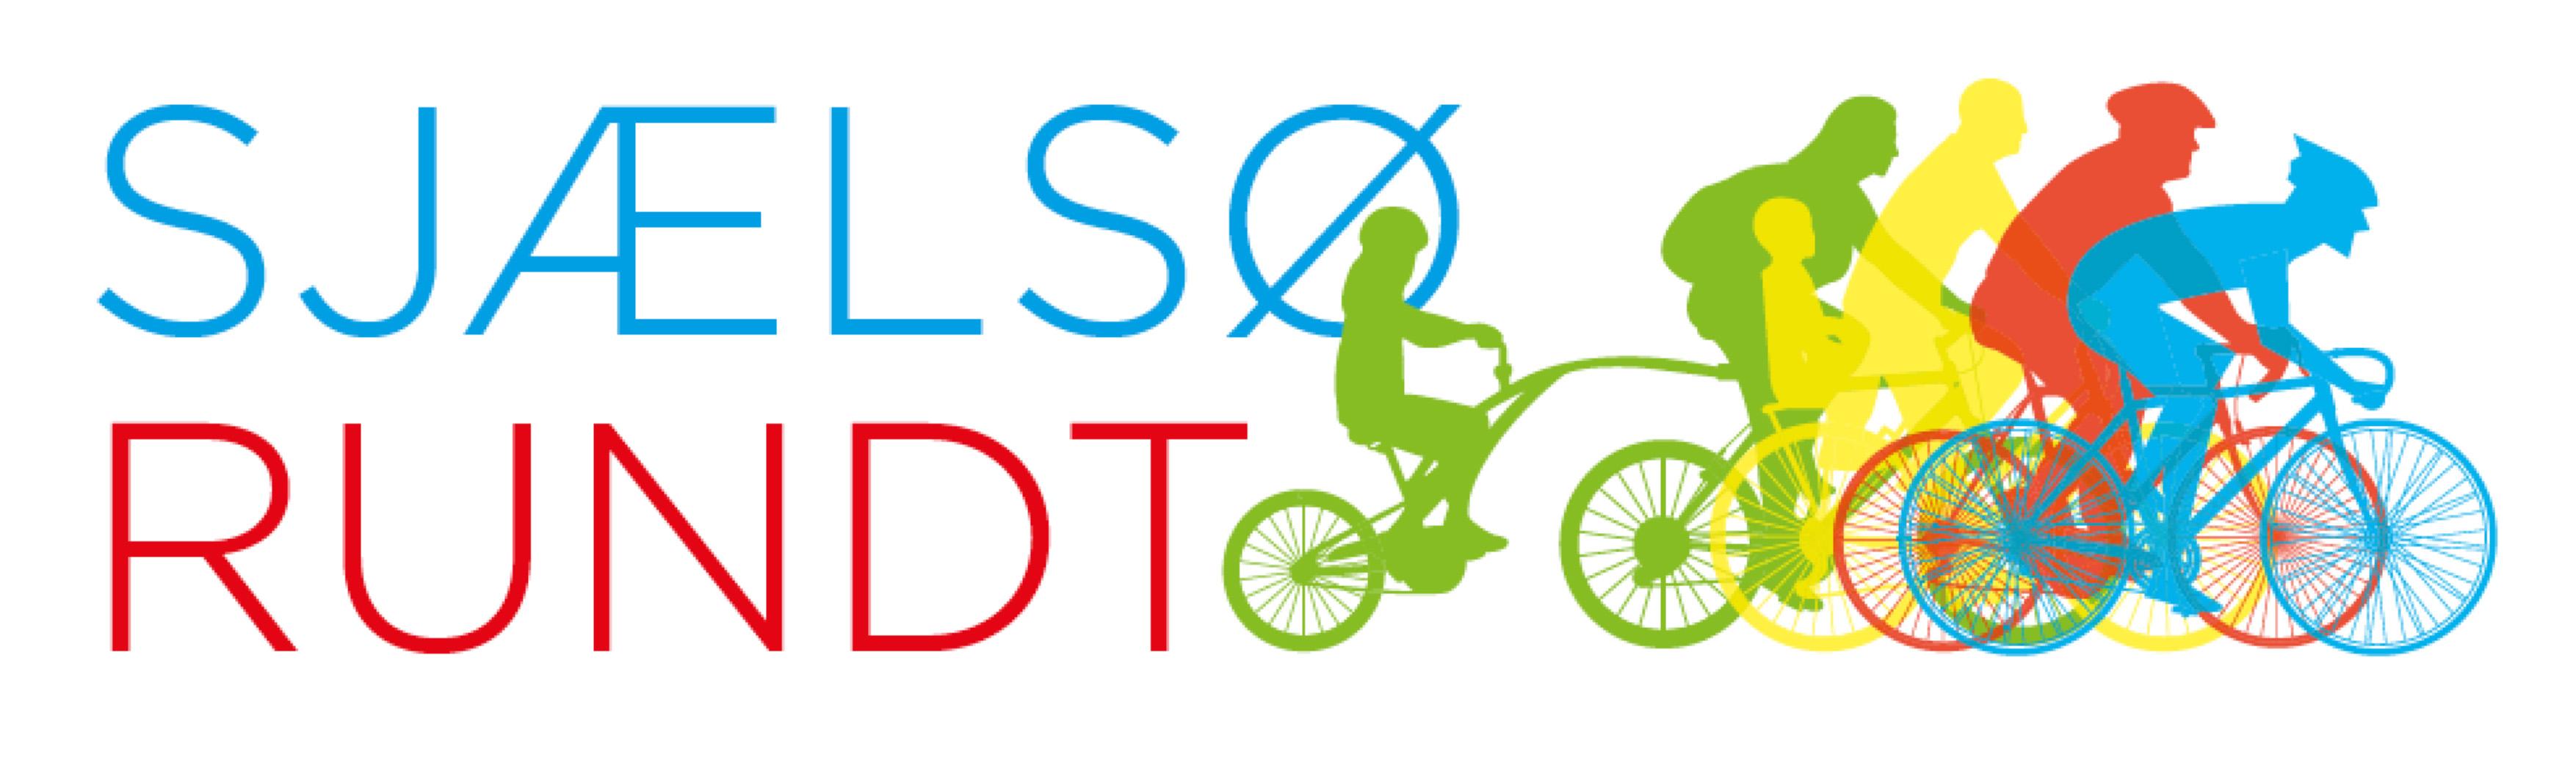 Sjælsø Rundt 2020 – Danmarks ældste motionscykelløb – 4 distancer